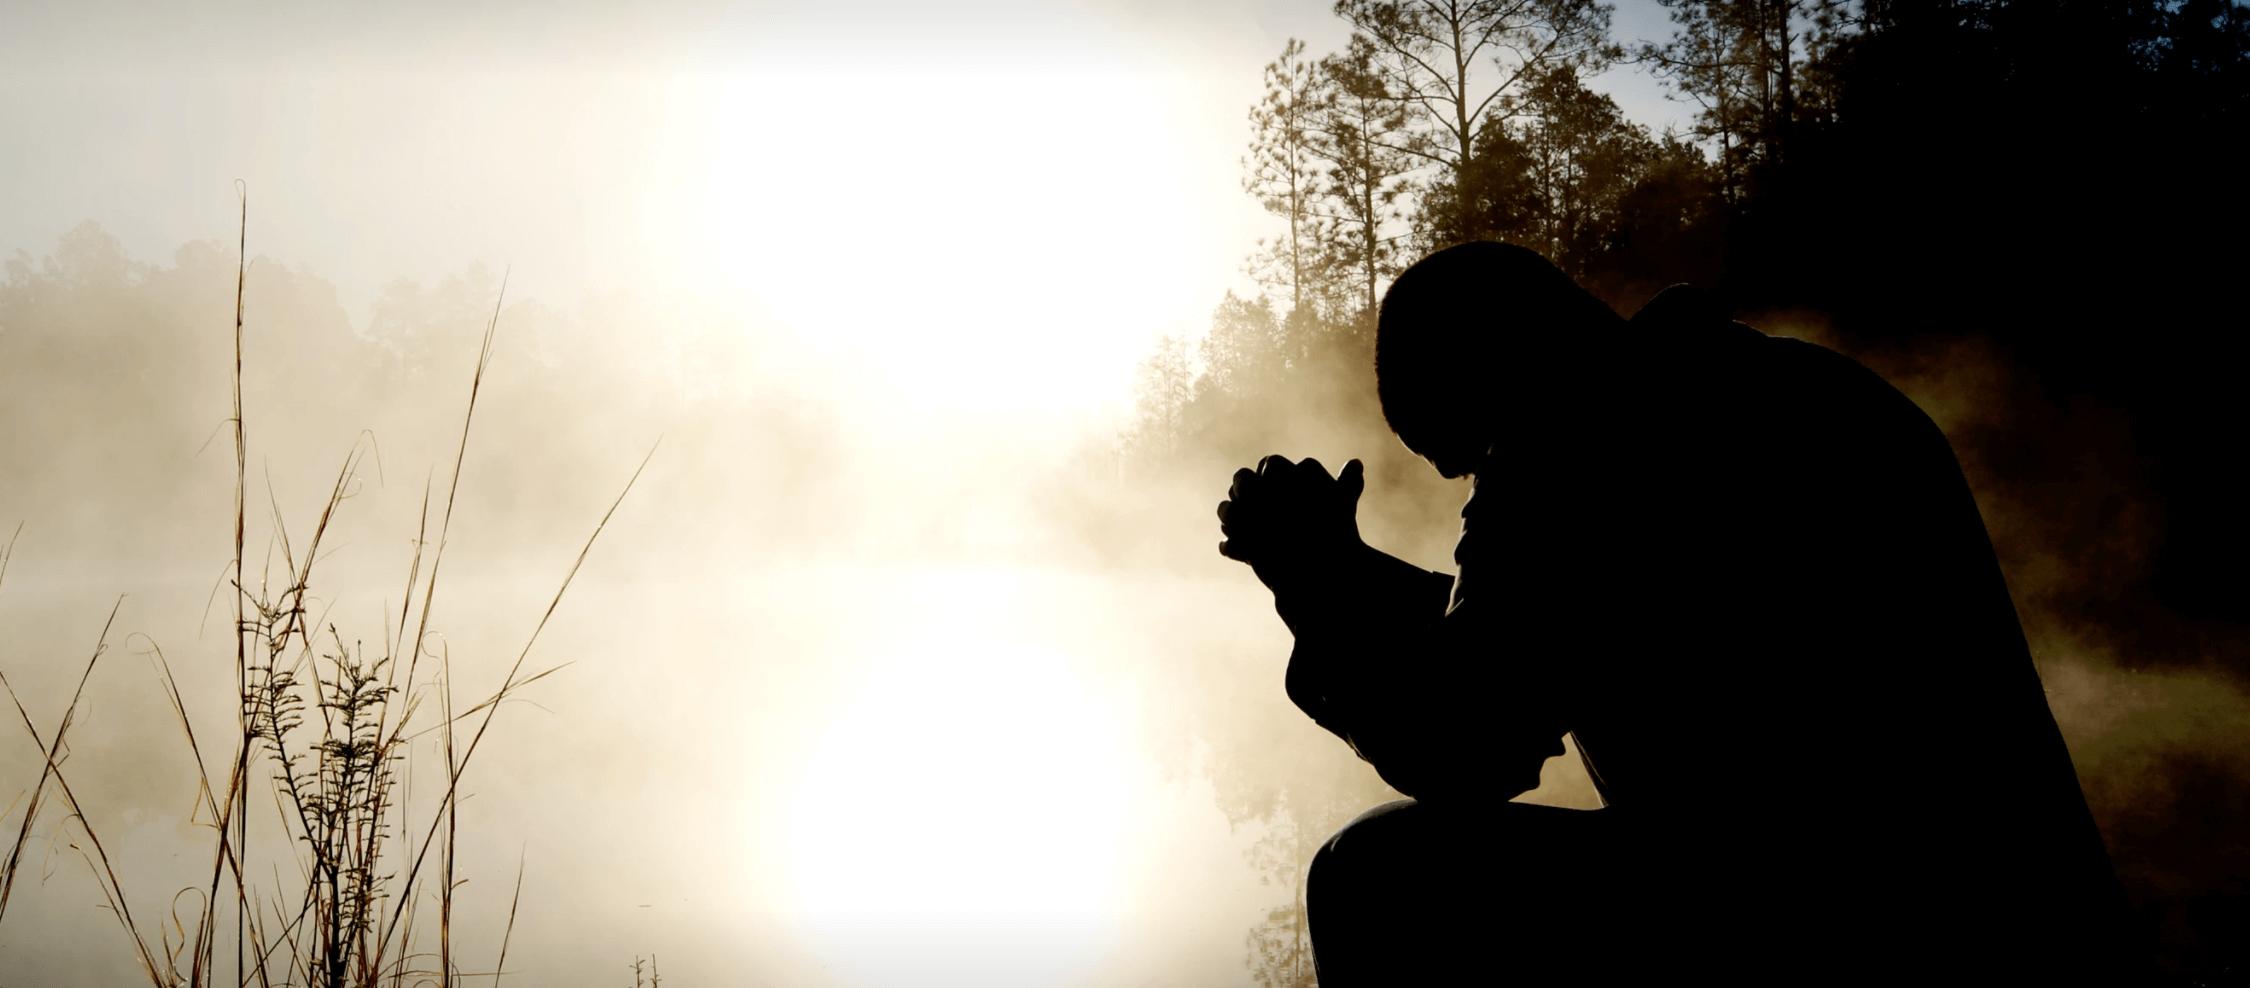 O luto e como a psicoterapia pode contribuir no processo